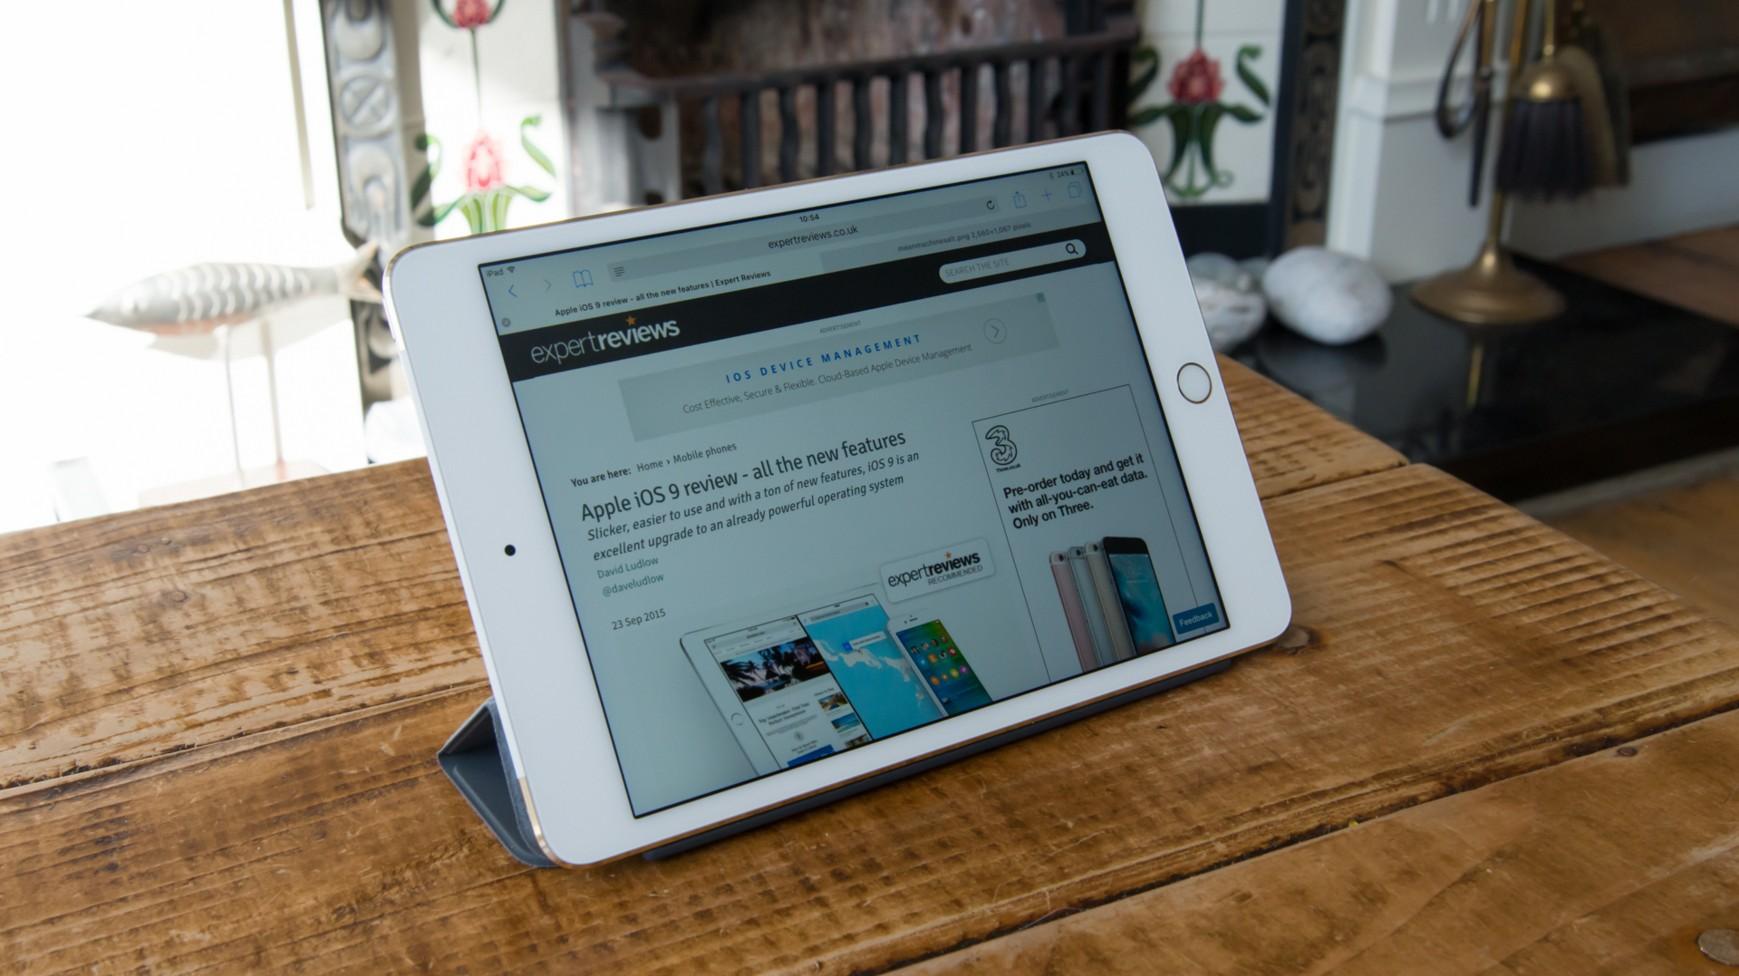 bon plan ipad mini 4 399 euros chez darty meilleur mobile. Black Bedroom Furniture Sets. Home Design Ideas